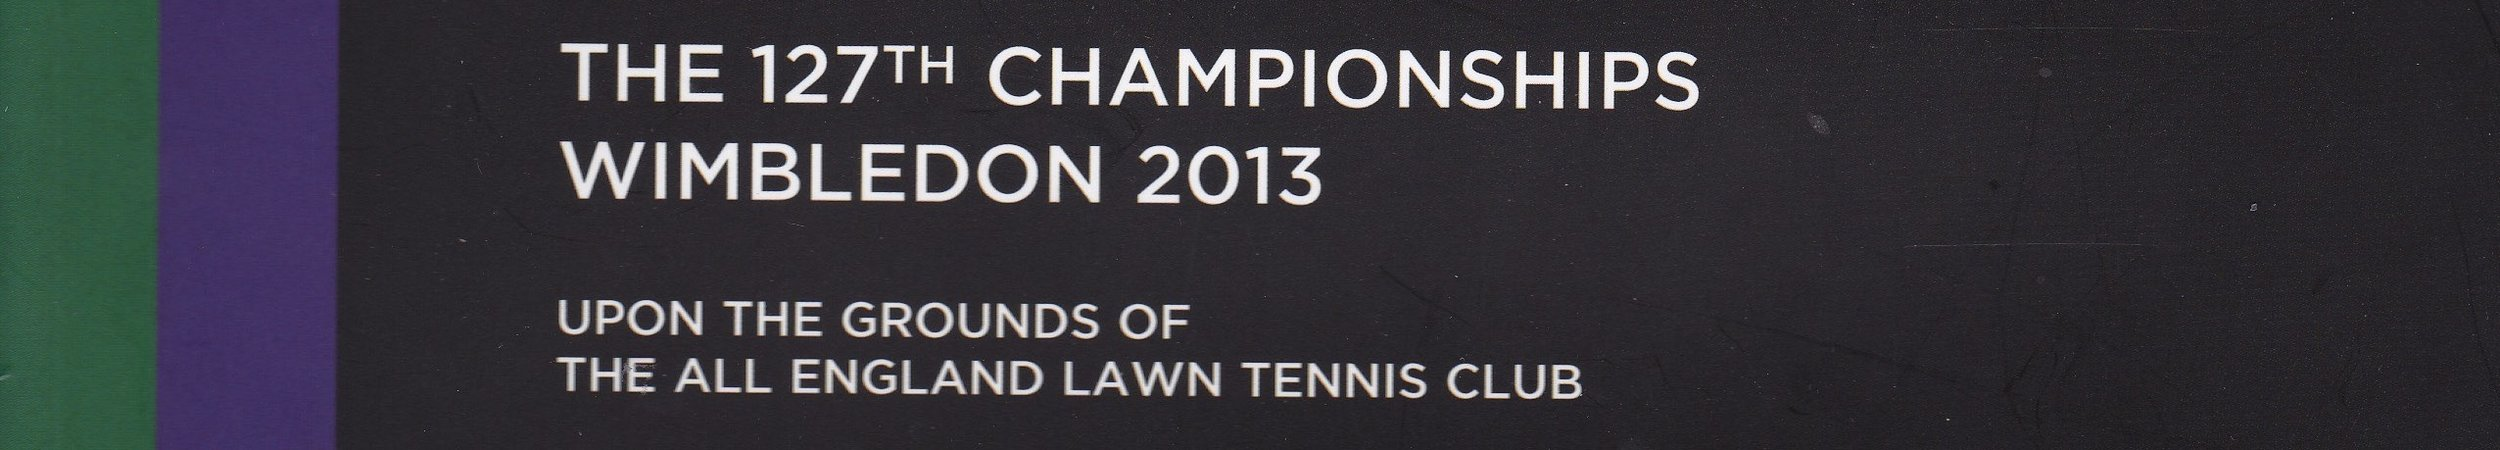 2013-06-24 Wimbledon.jpg